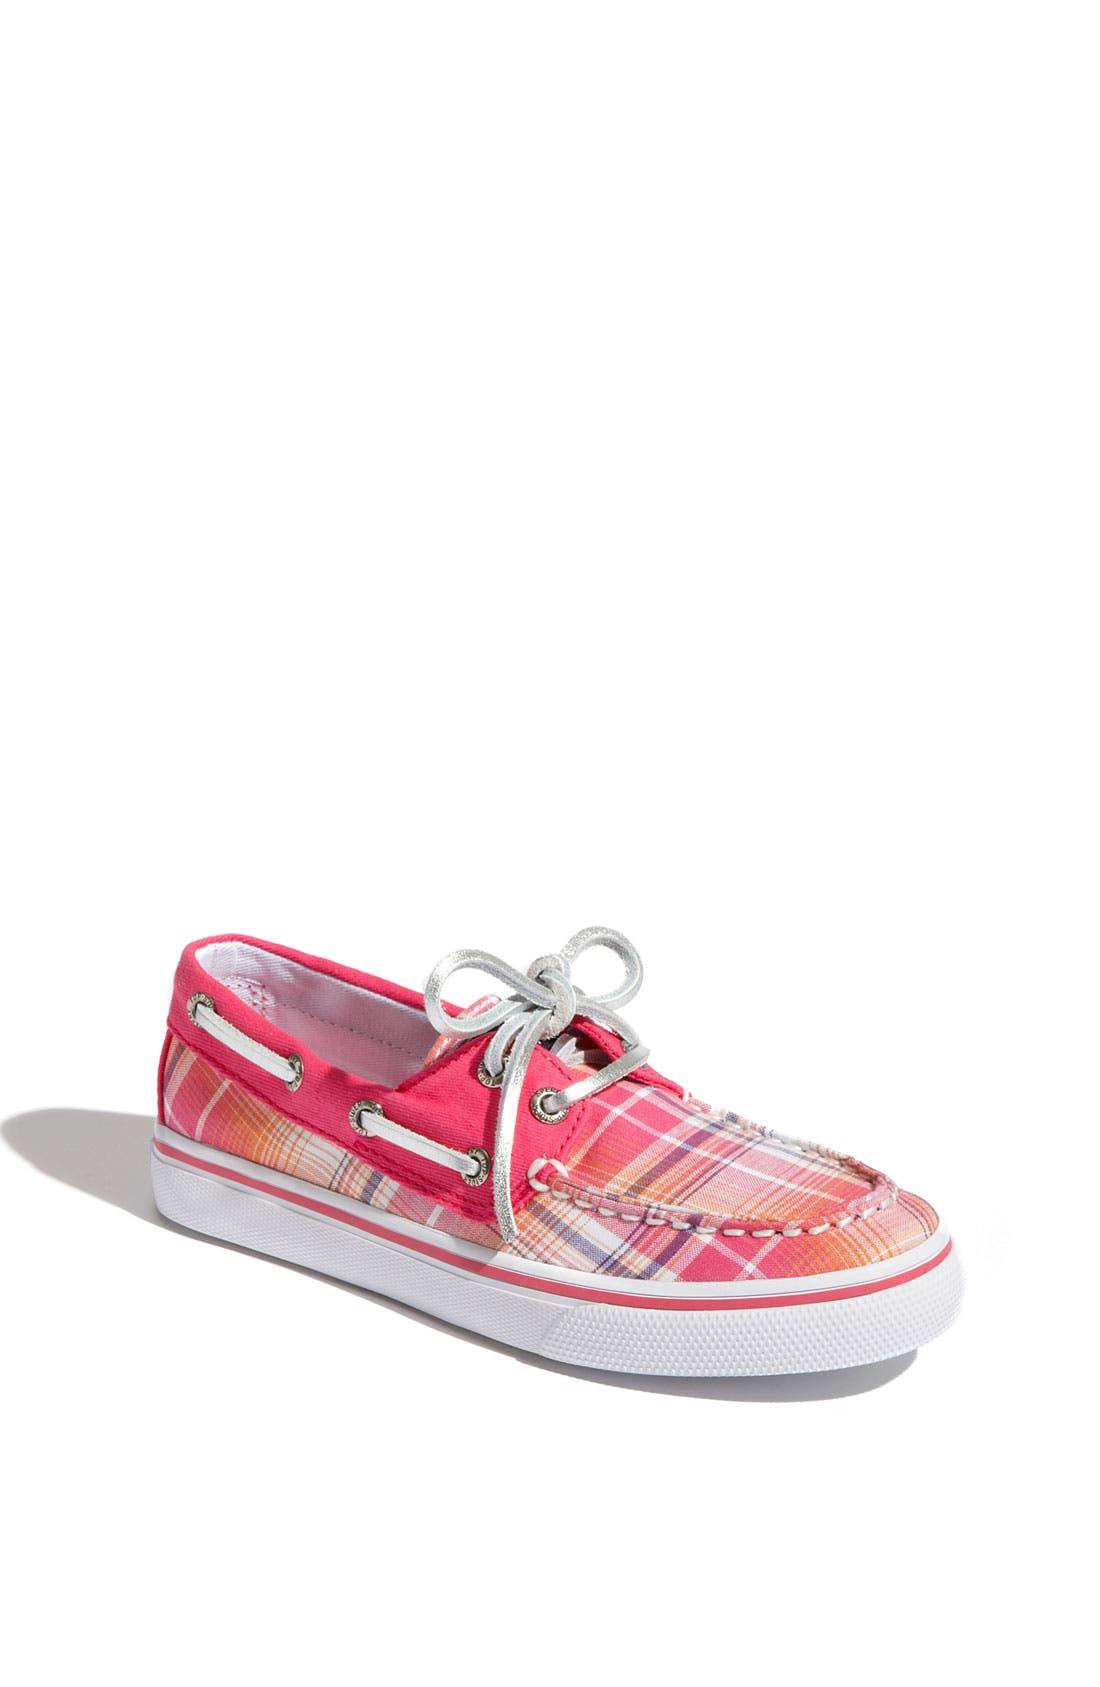 Alternate Image 1 Selected - Sperry Top-Sider® 'Bahama' Boat Shoe (Little Kid & Big Kid)